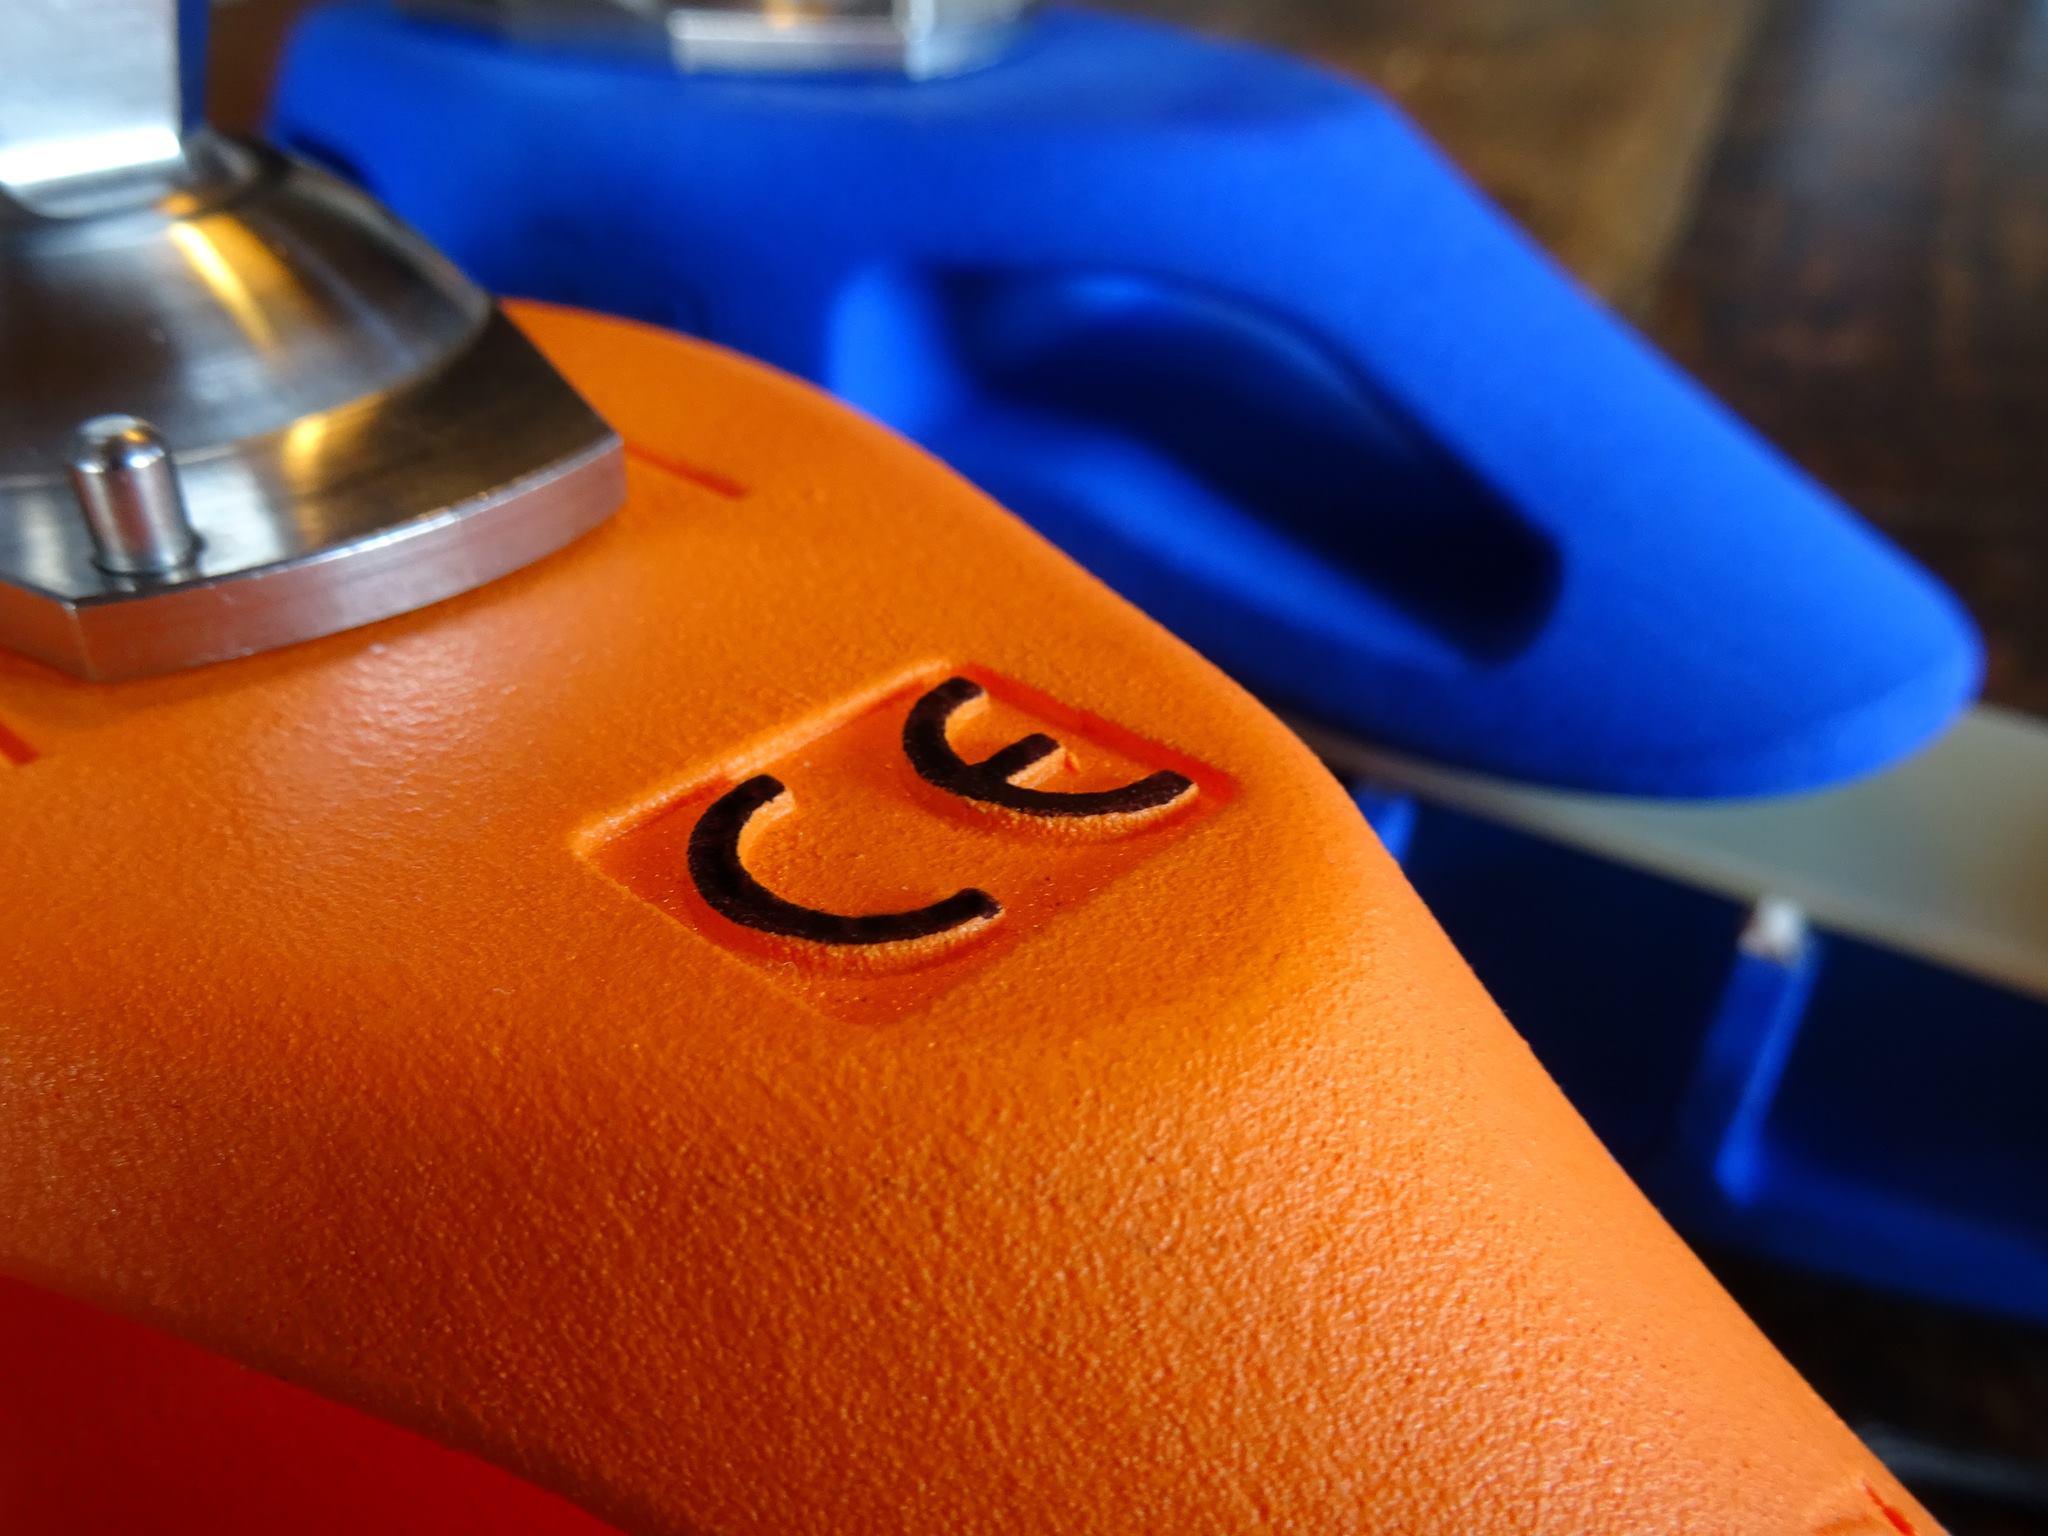 Close-up of the CE marking on the Mecuris prosthetic. Photo via Mecuris.